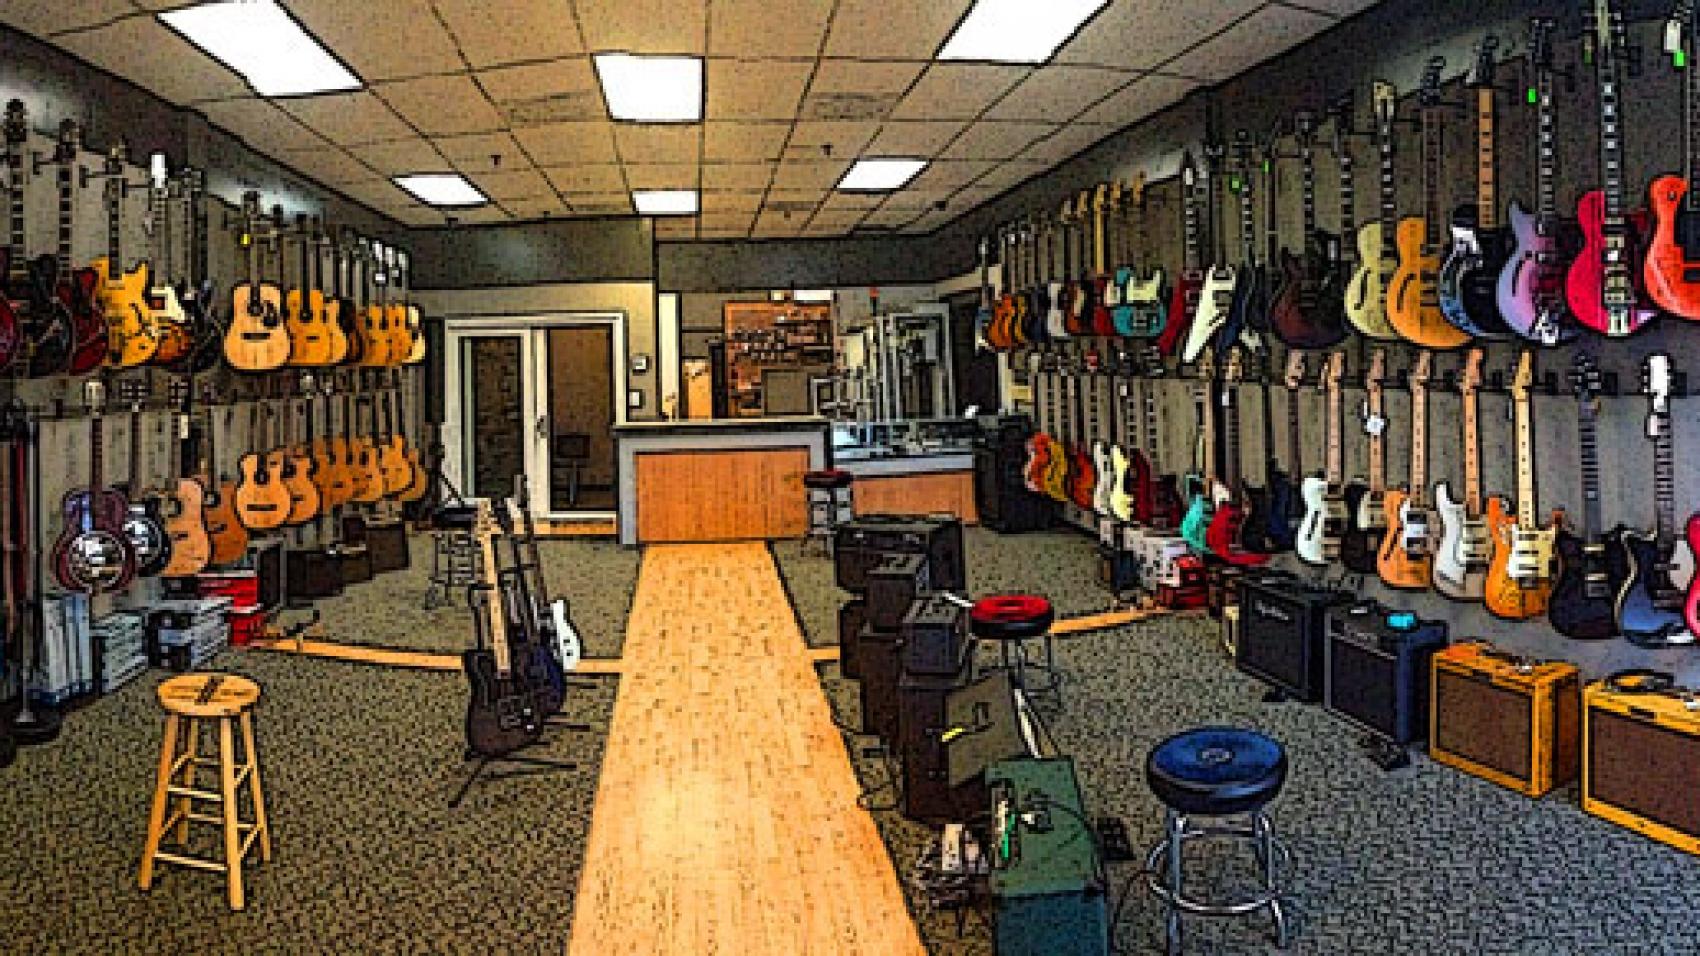 Photo of Crossroads Guitar Shop interior